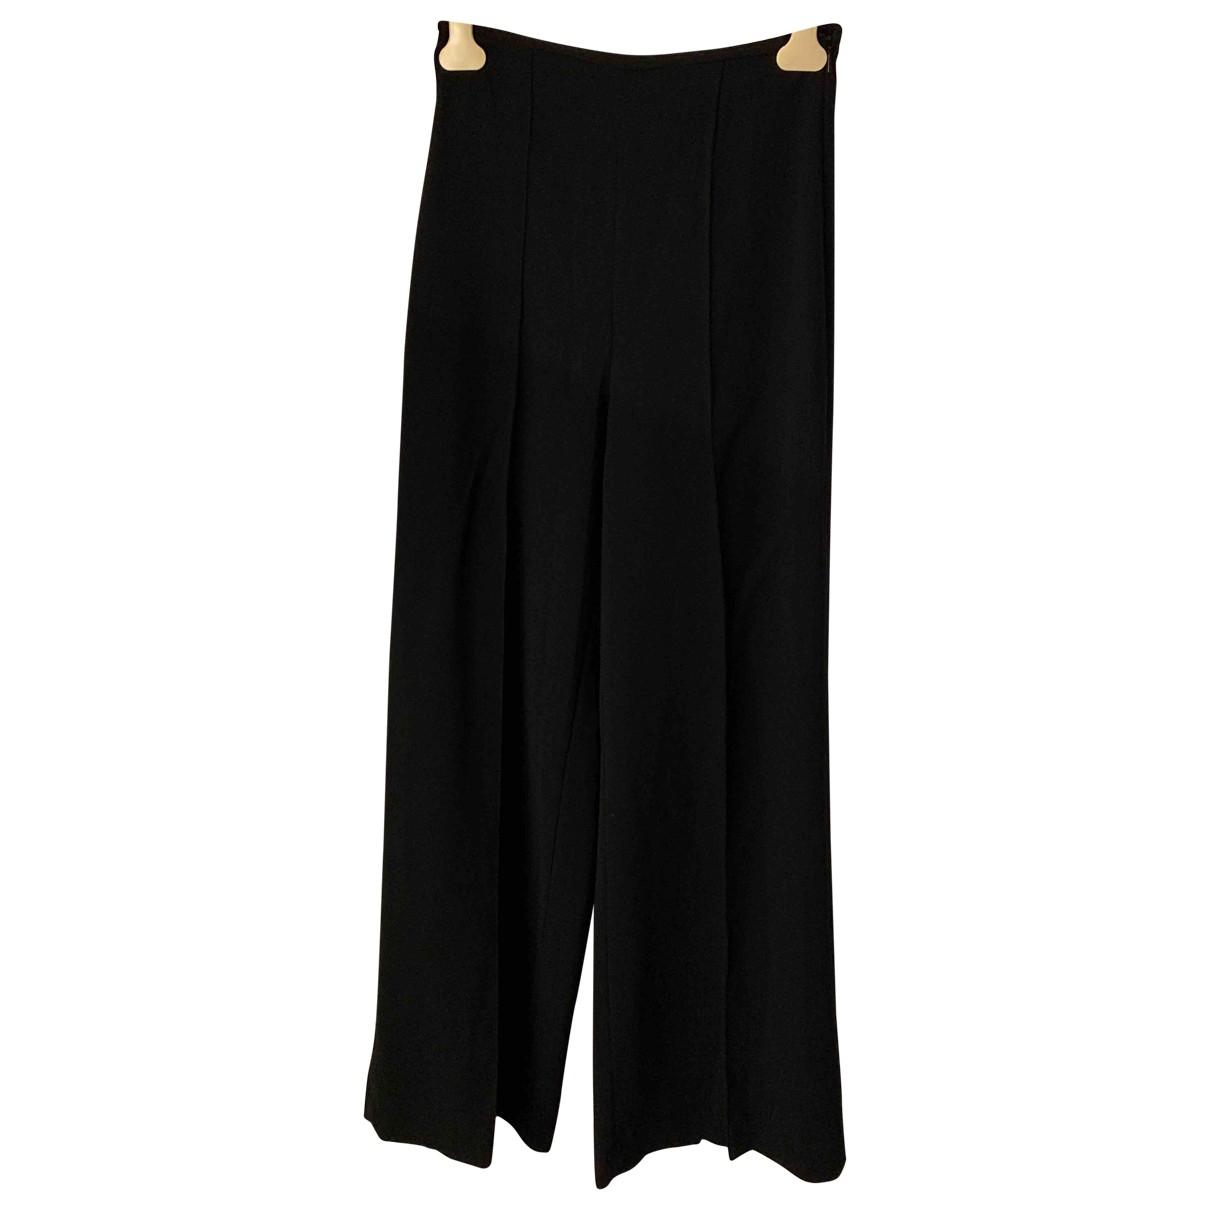 Mango \N Black Trousers for Women 38 FR